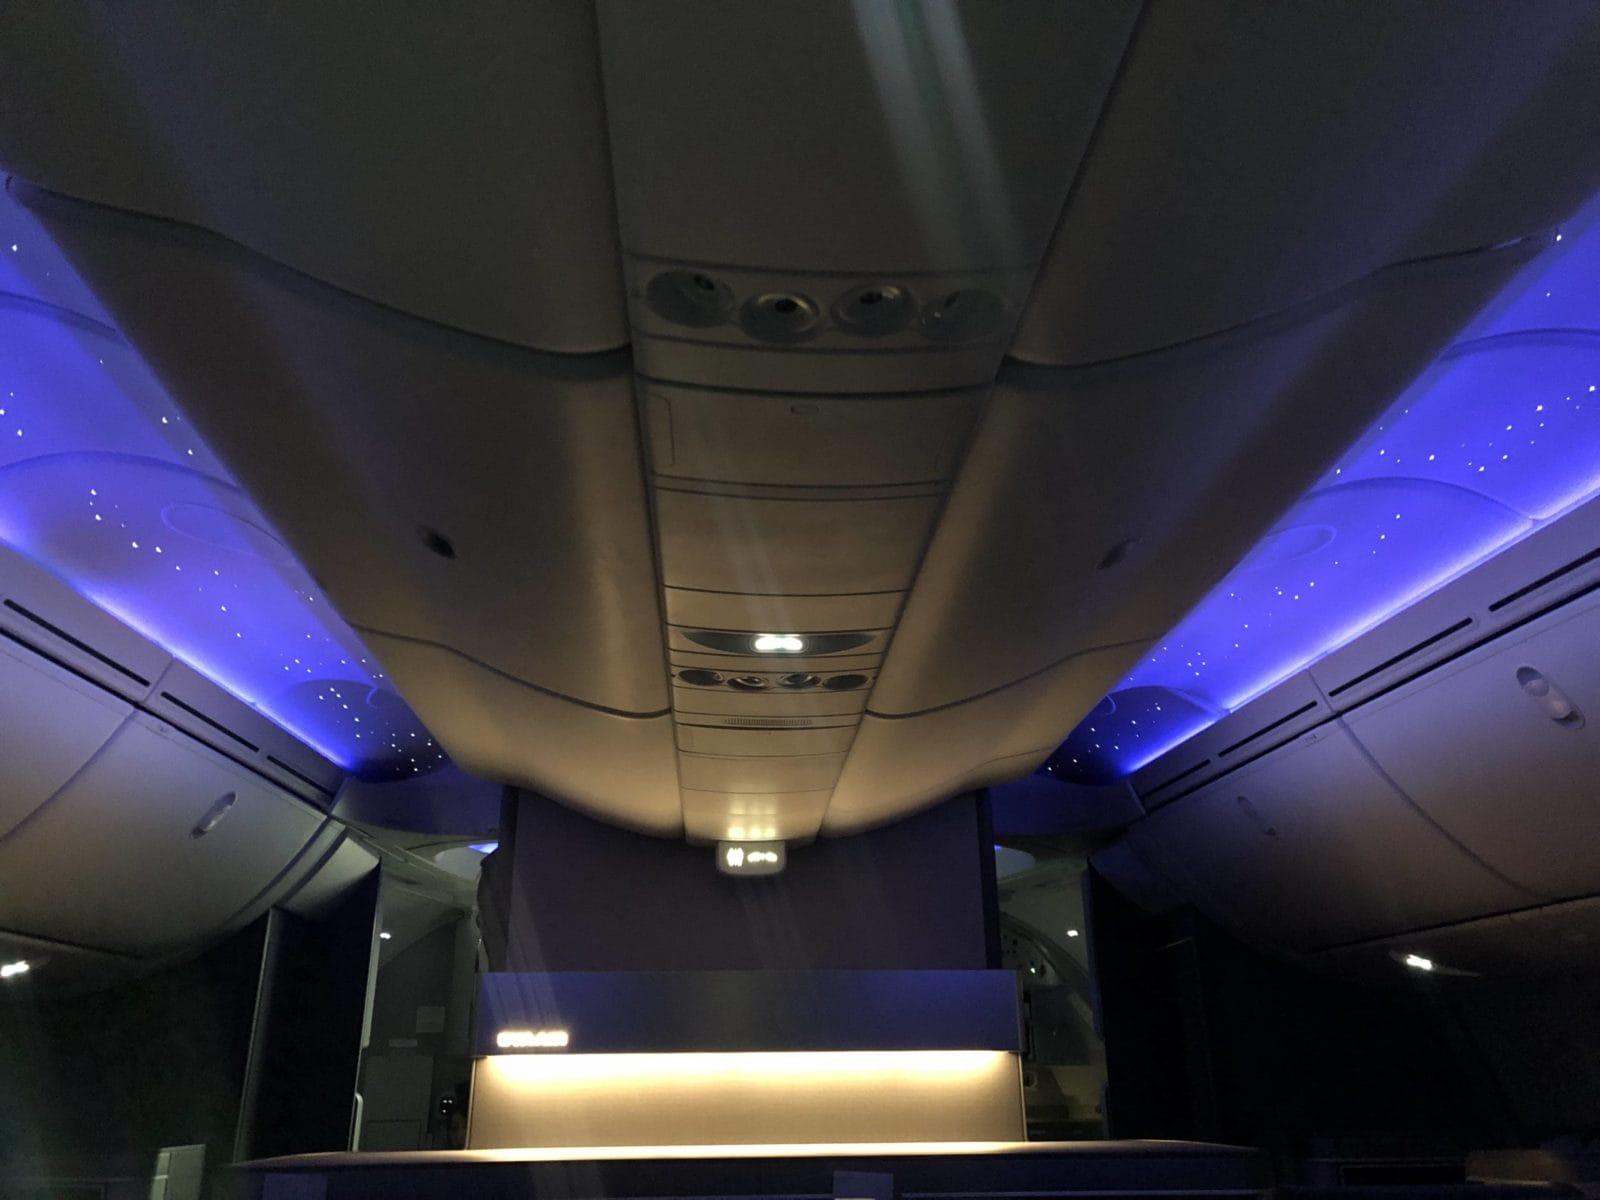 EVA Air neue Business Class 787-9 Nachtbeleuchtung Sterne